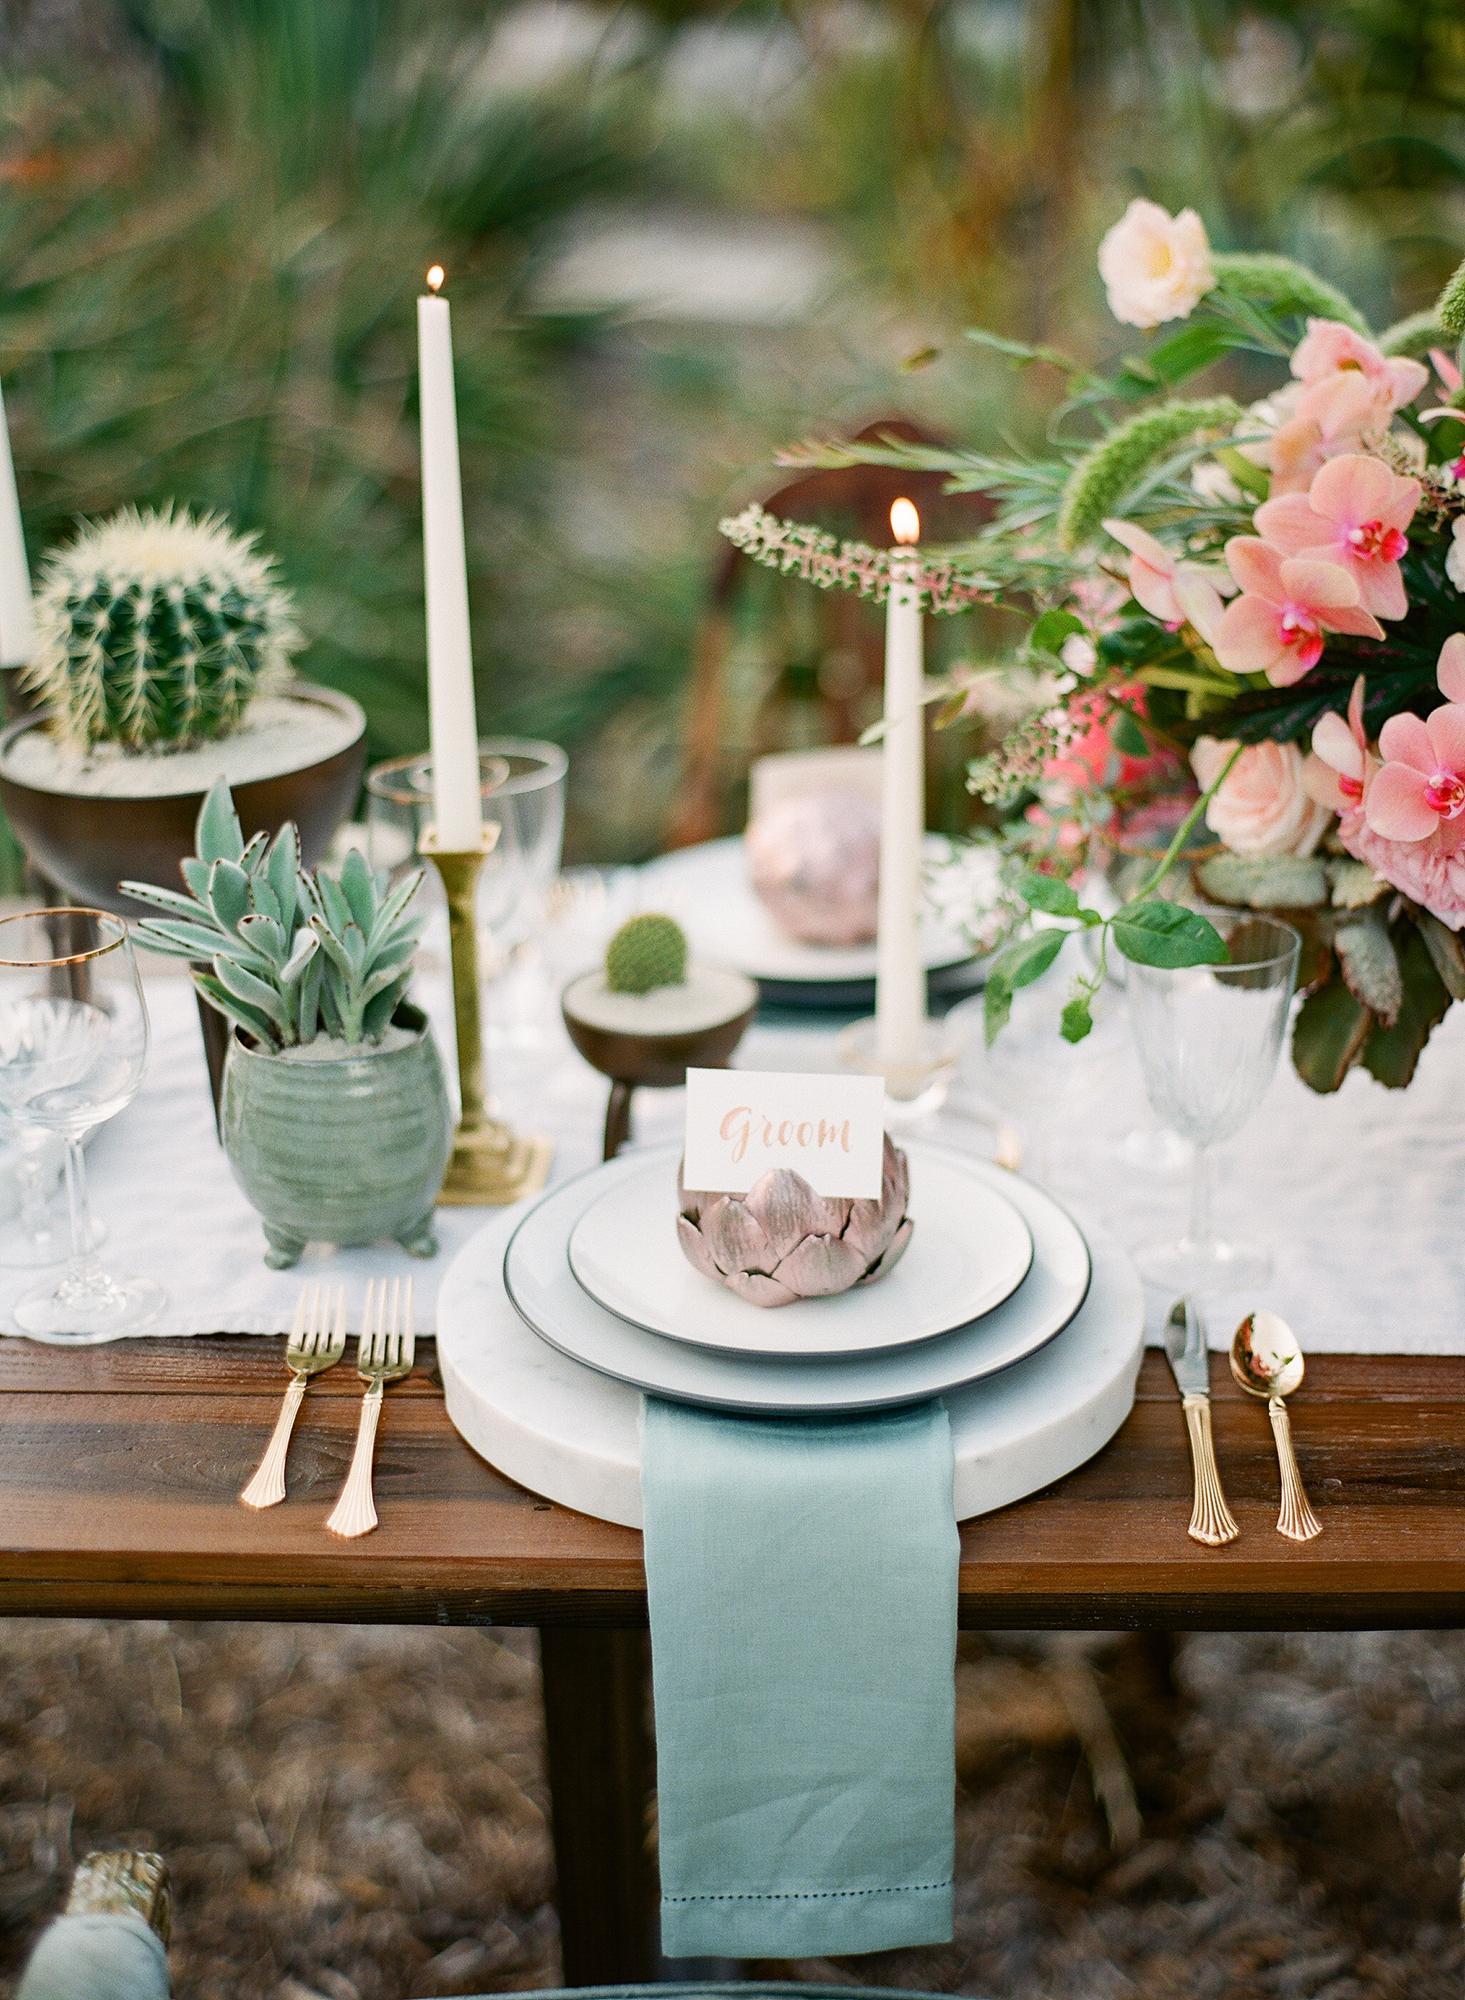 desert inspired wedding artichoke place card